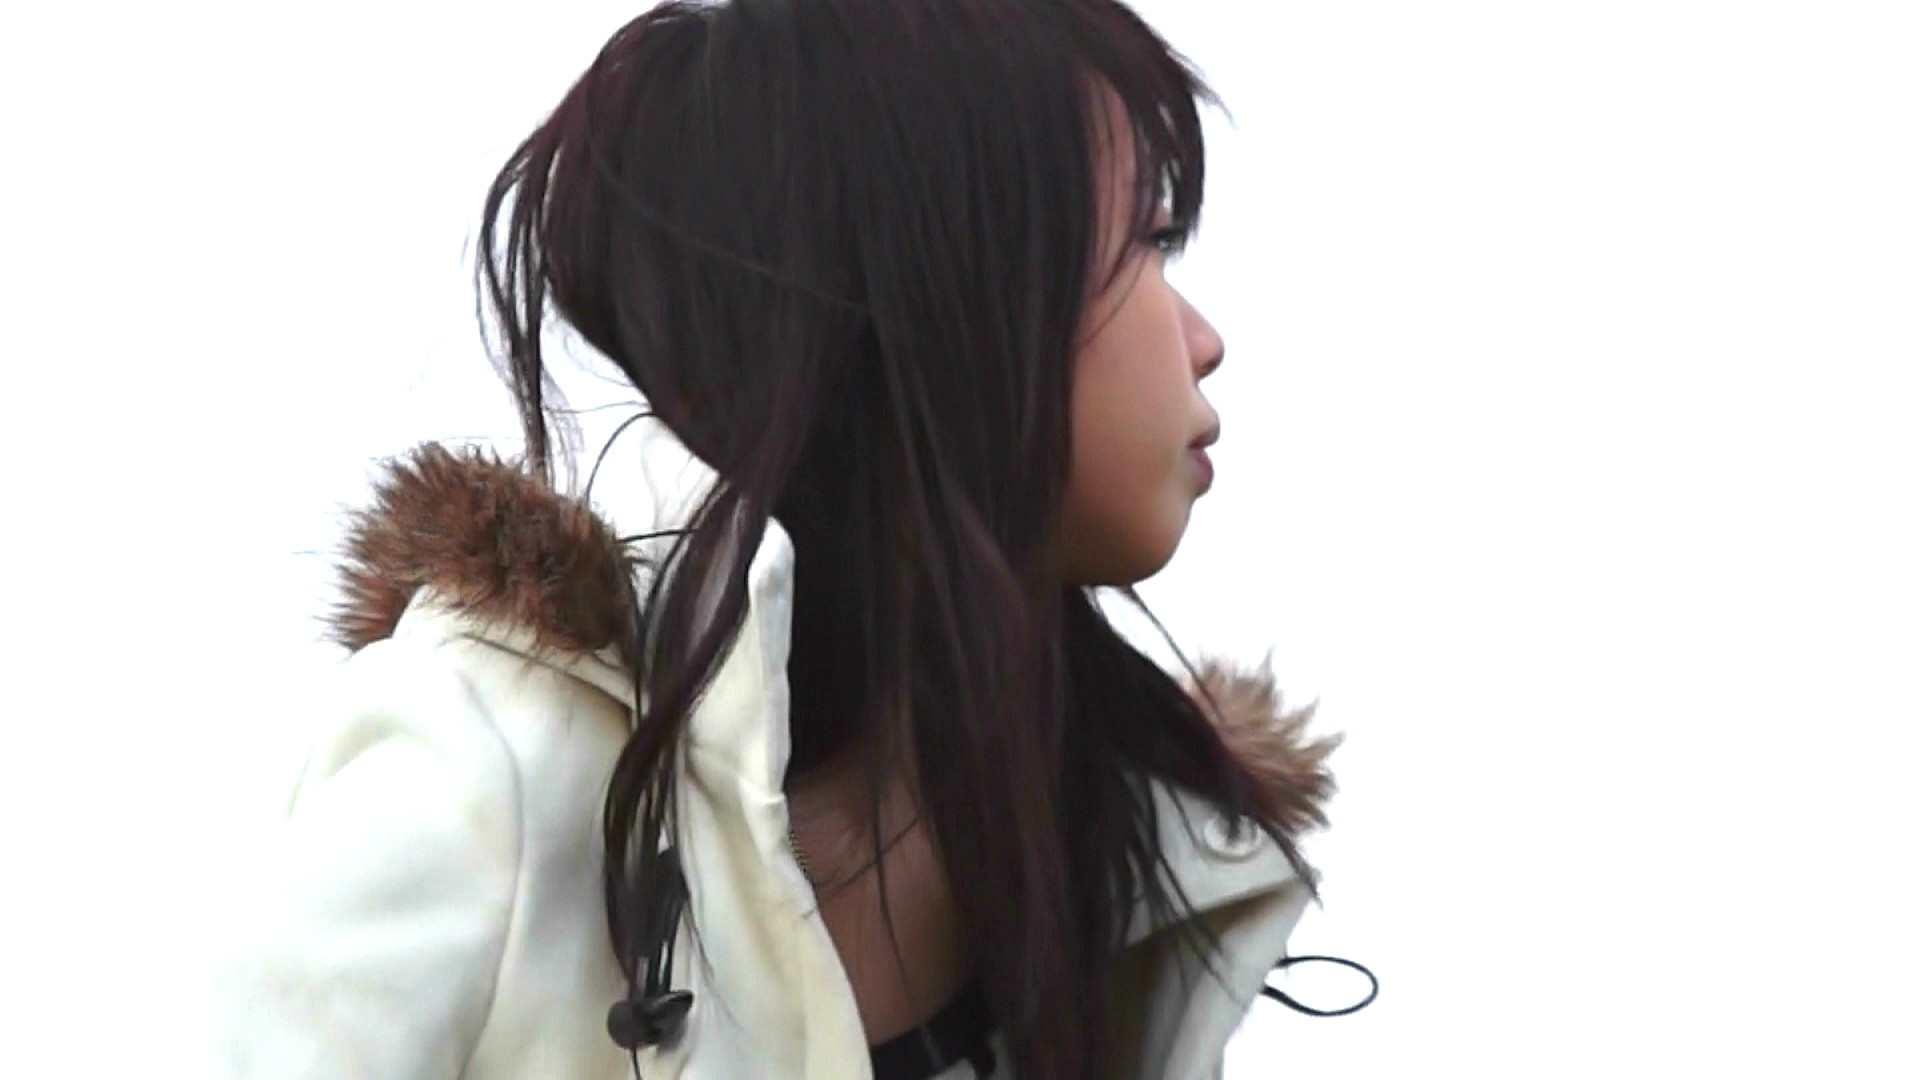 vol.2 自宅近く思い出の地で黄昏る志穂さん お姉さん  57PIX 50